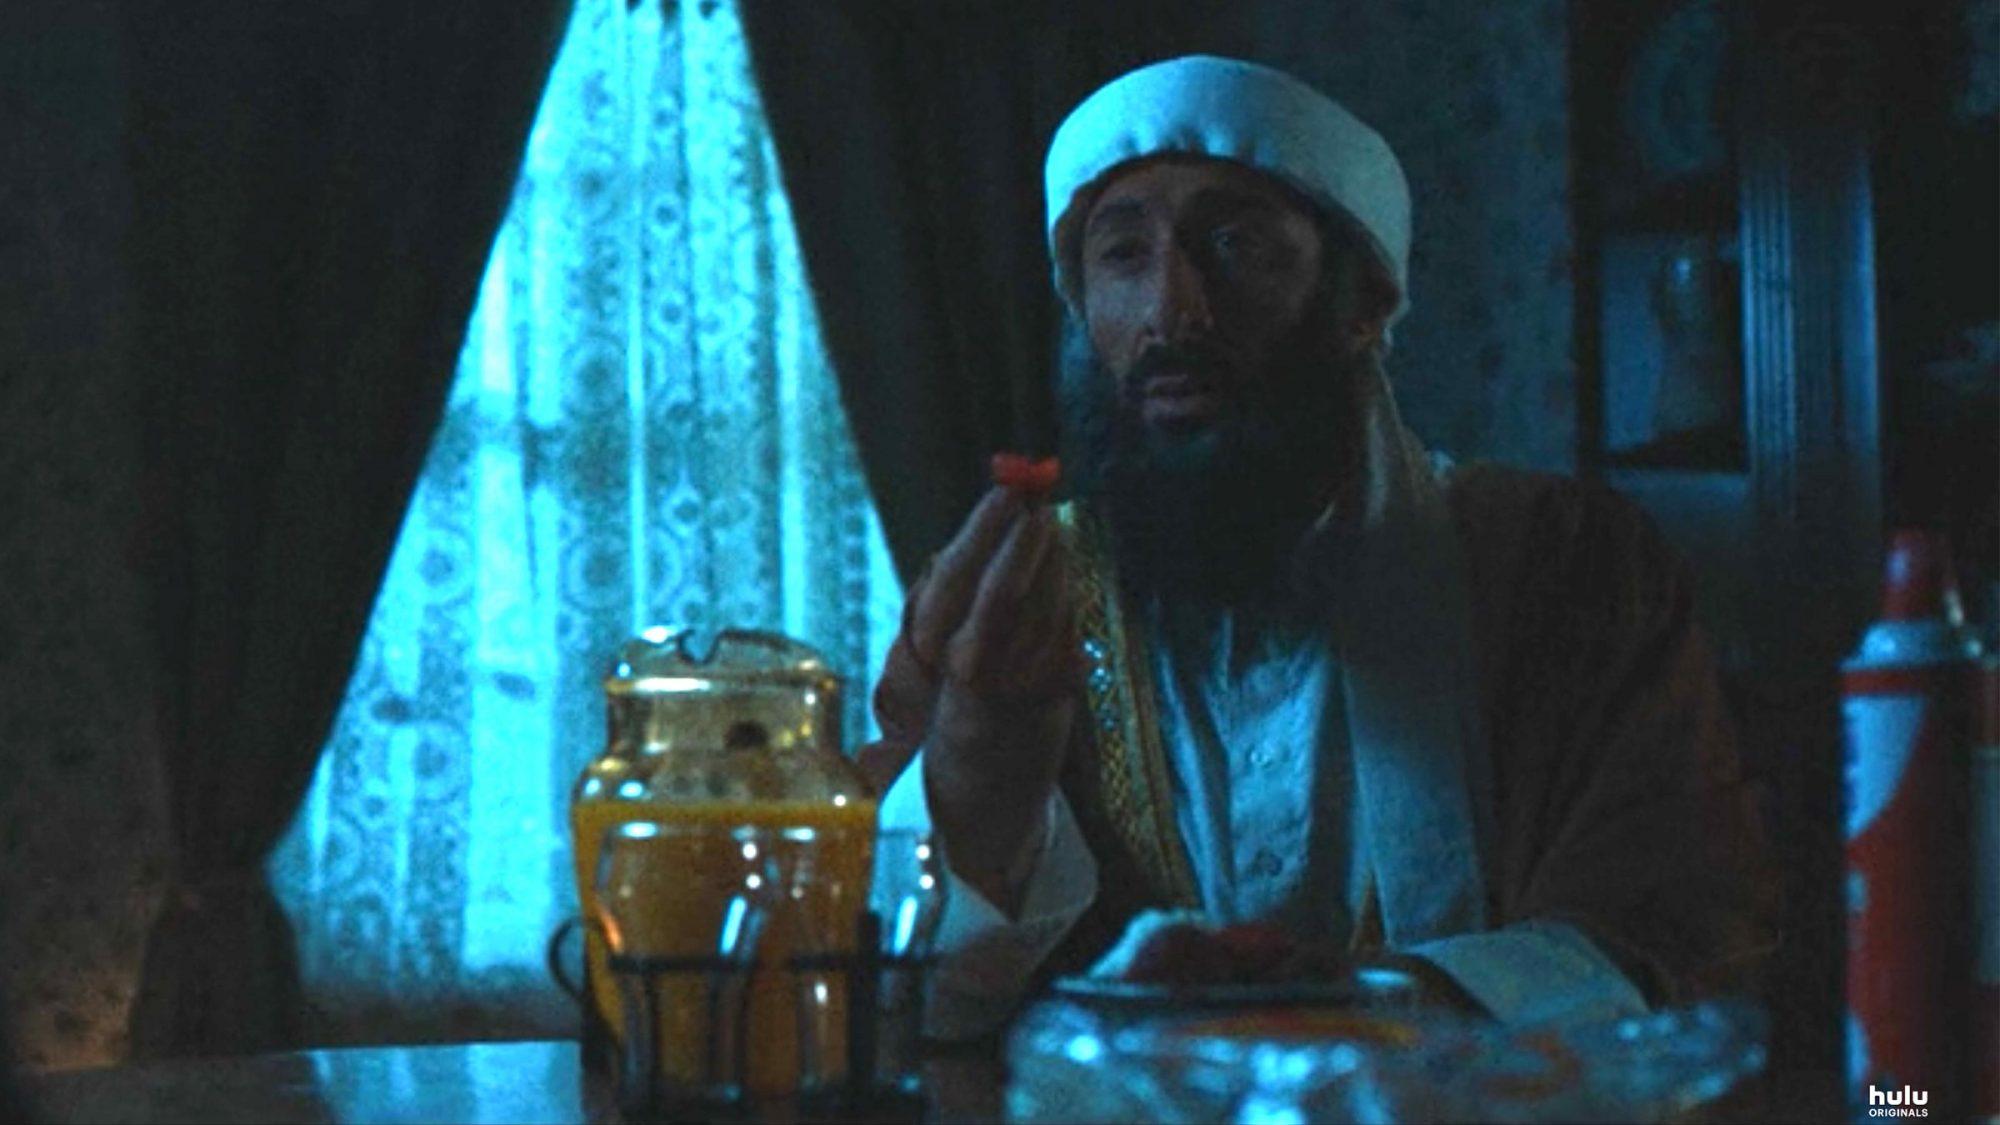 Osama Bin Laden appears as a character on Ramy